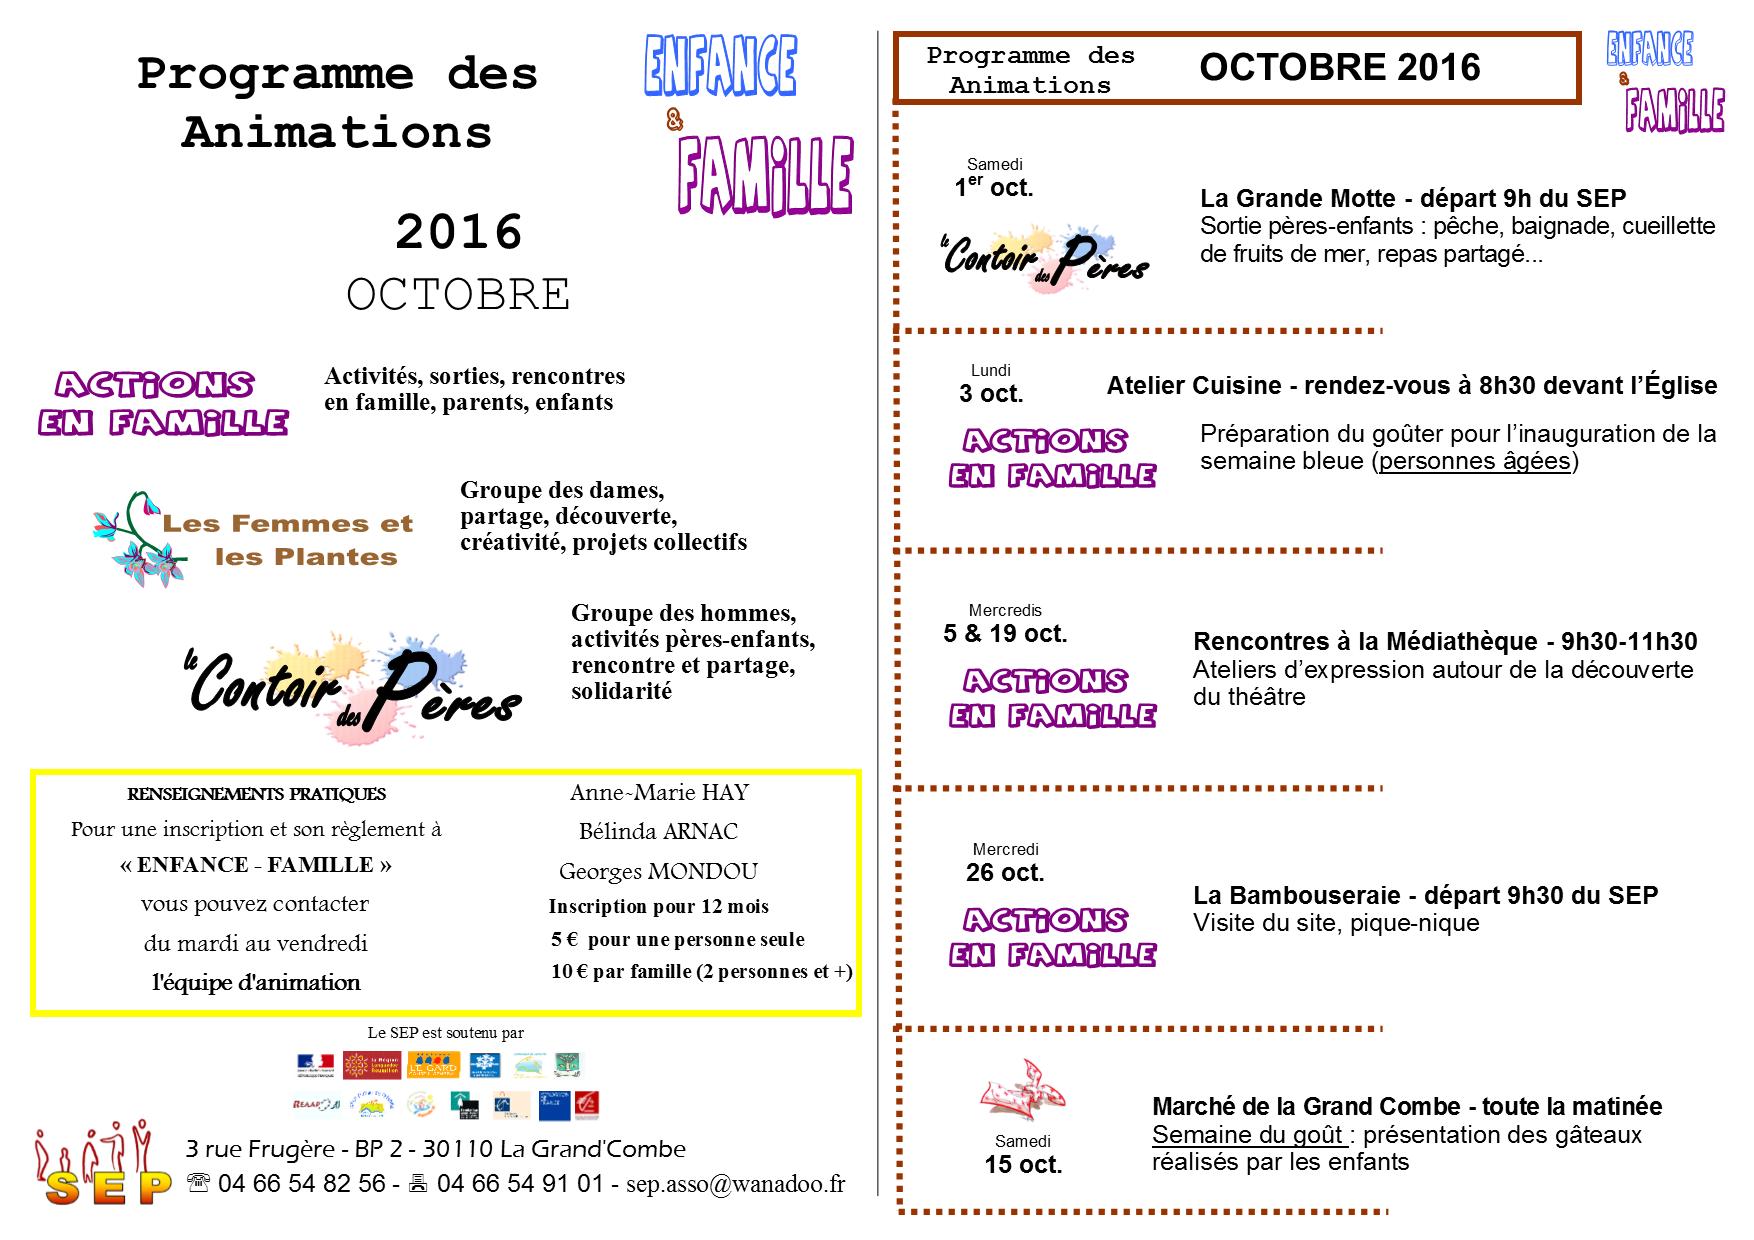 ejp-2016-10-programme-oct